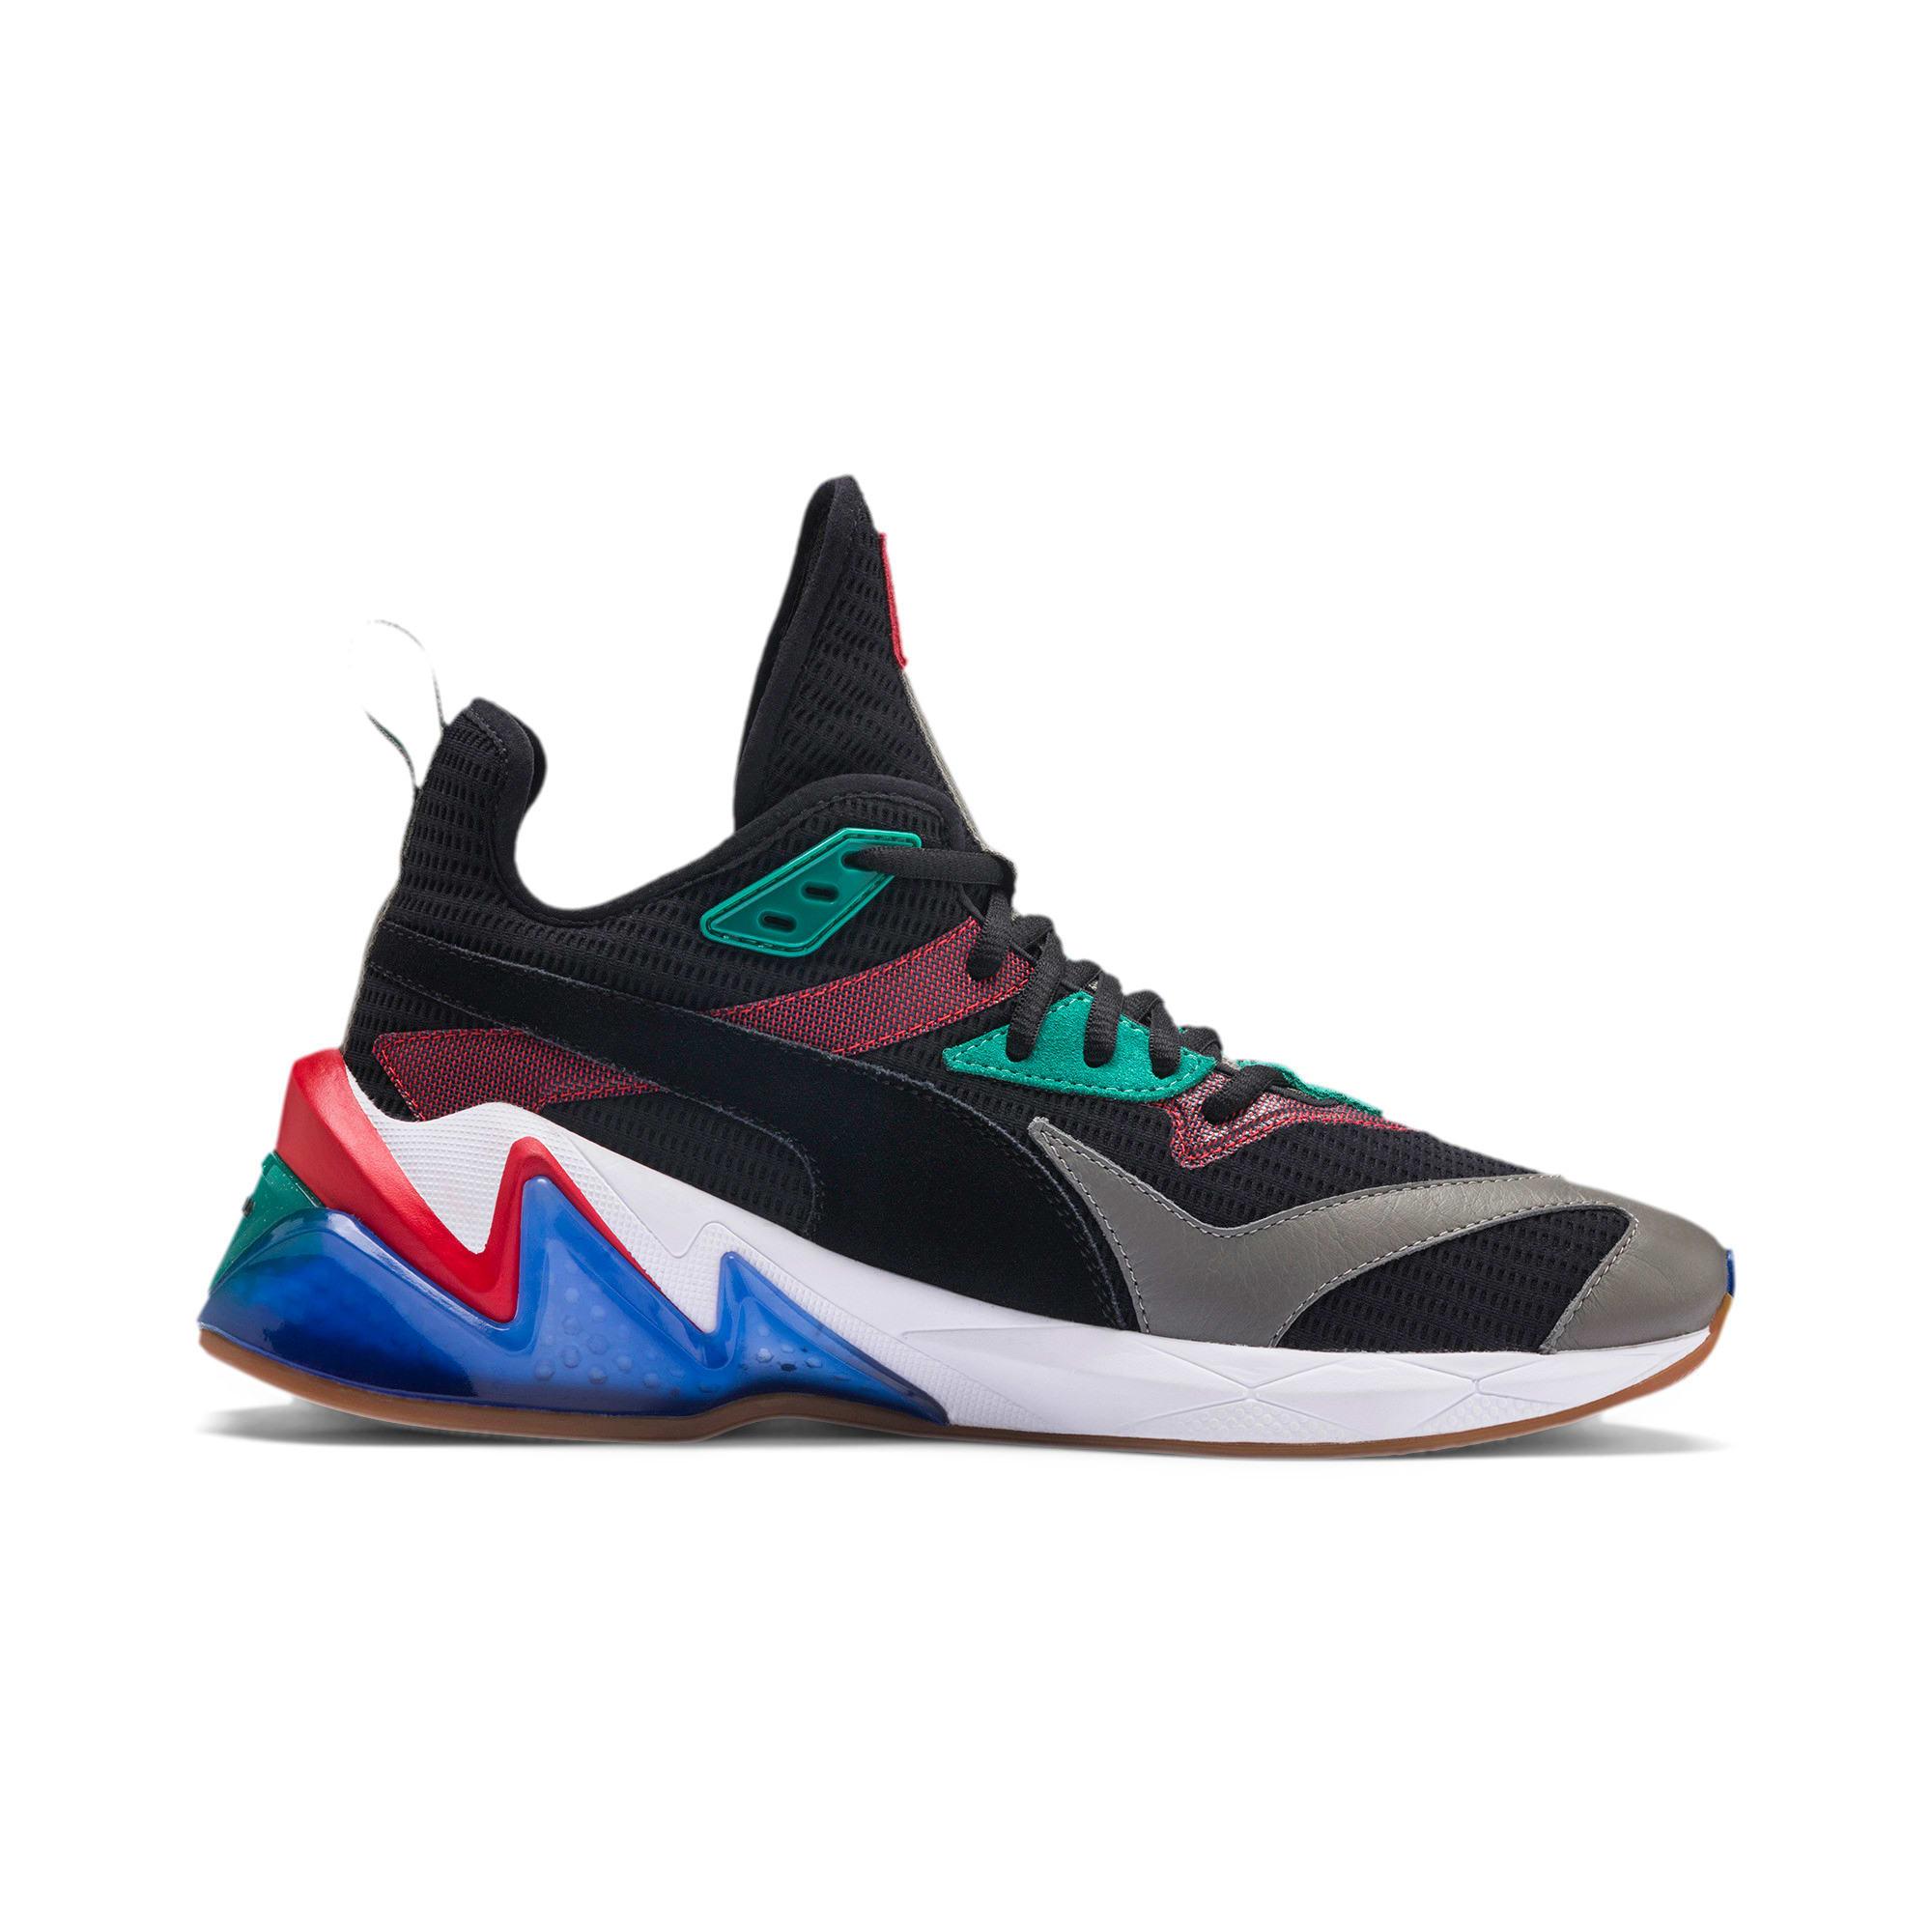 Thumbnail 5 of LQDCELL Origin Herren Sneaker, Puma Black-Cadmium Green, medium